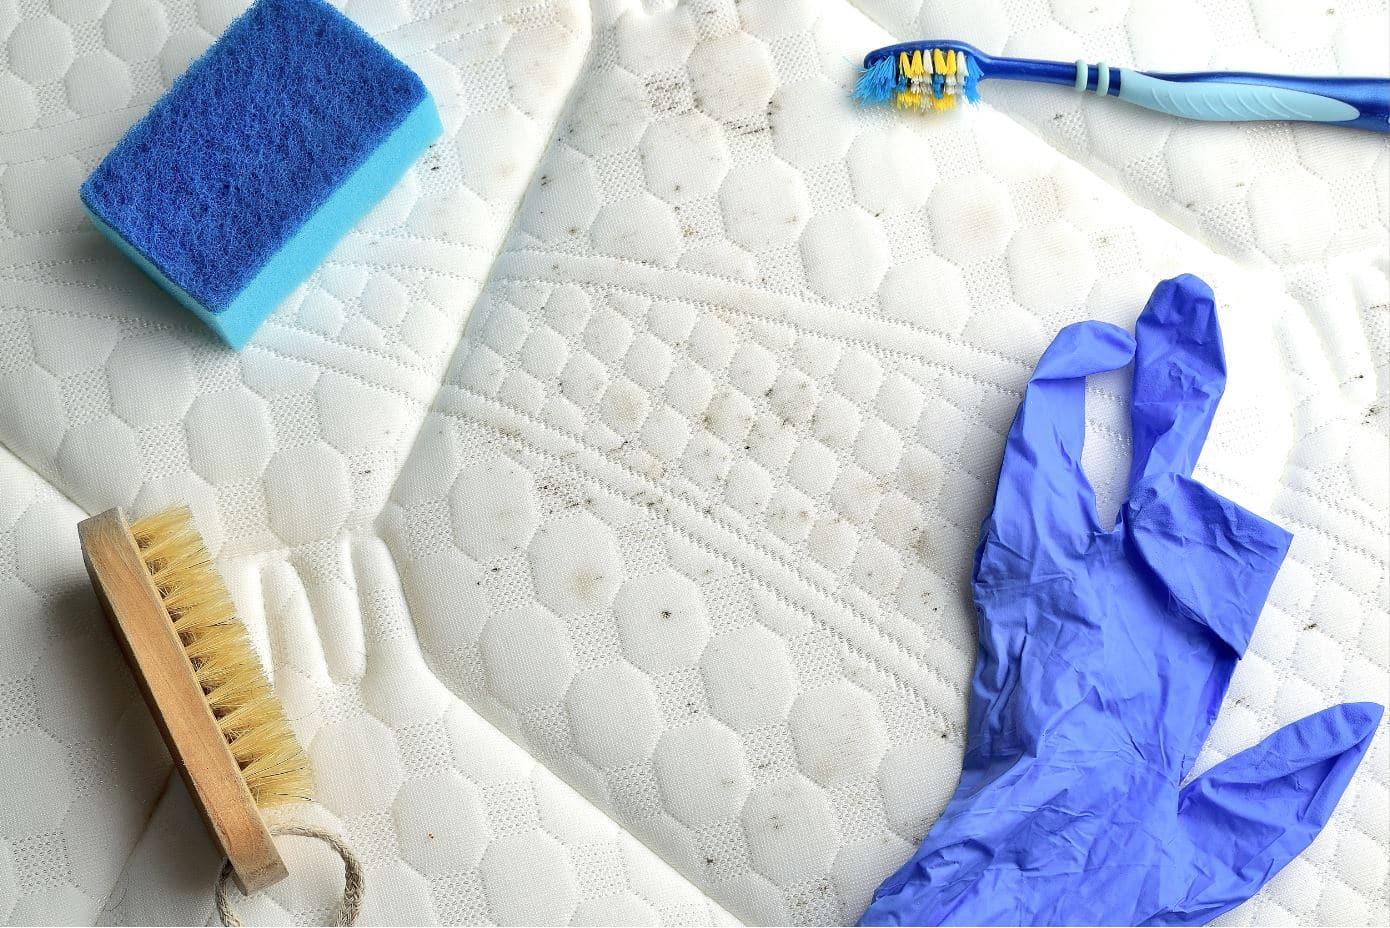 mattress cleaning equipment on a dirty white mattress